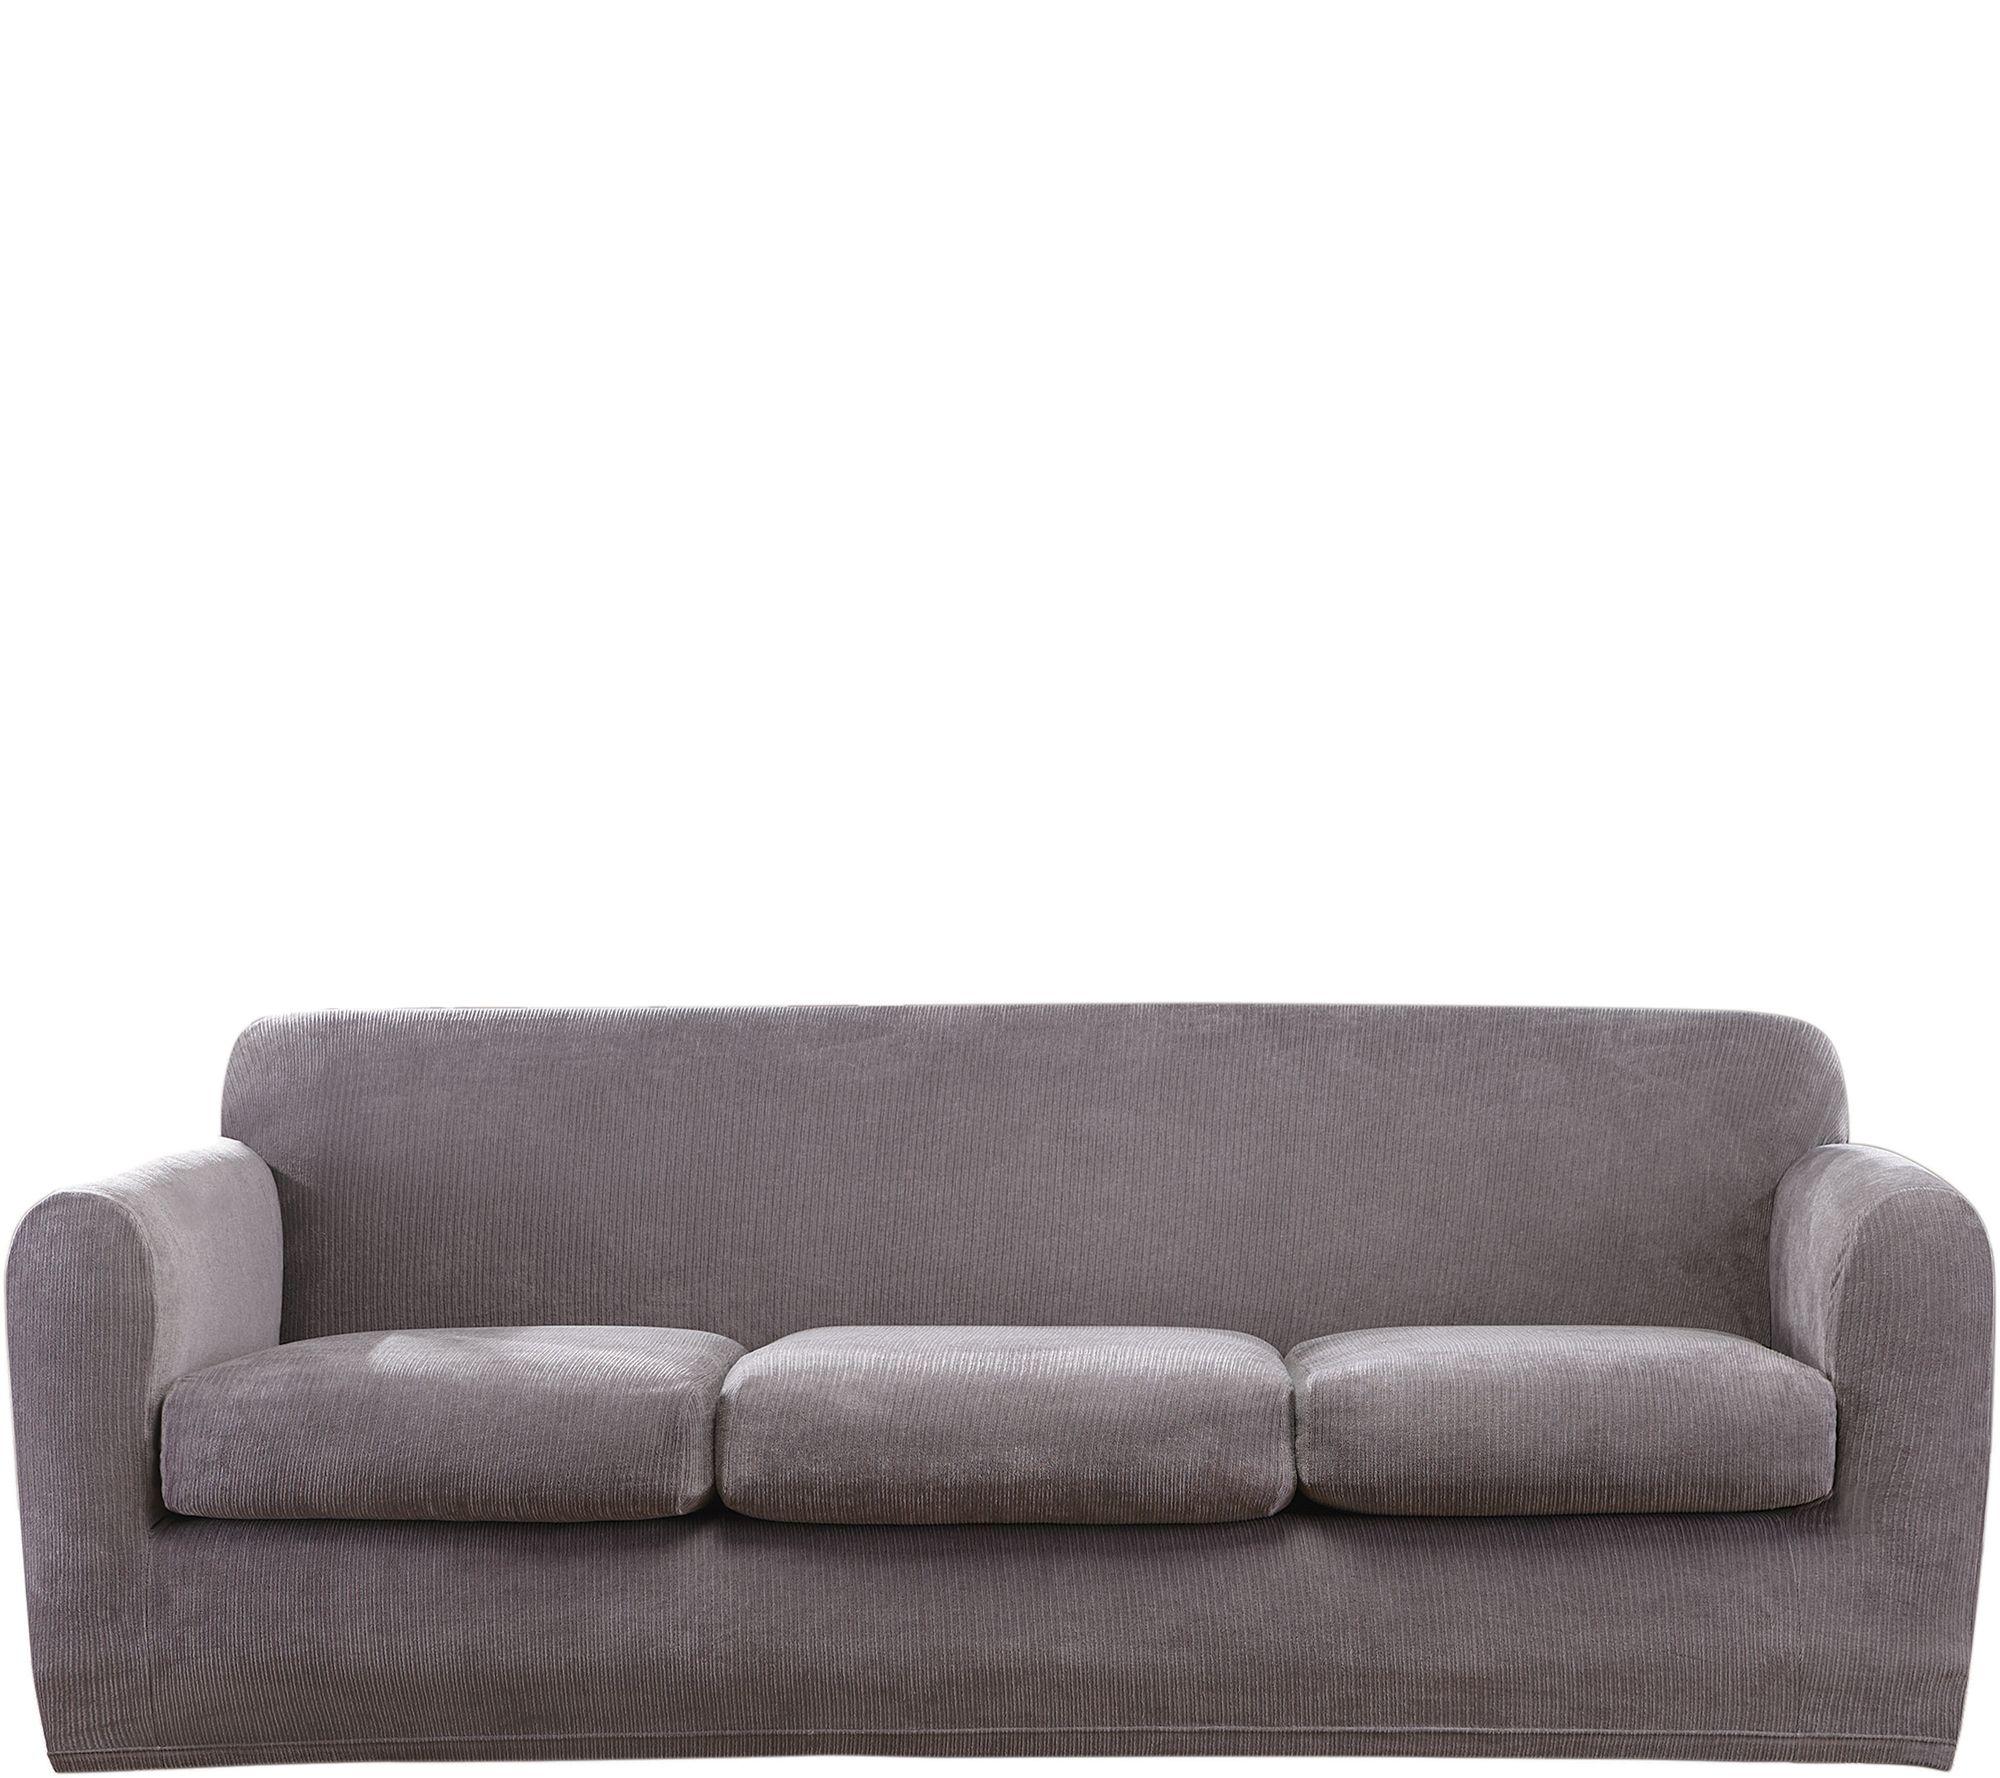 Sure Fit Stretch Chenille 3 Cushion Sofa Slipcover U2014 QVC.com